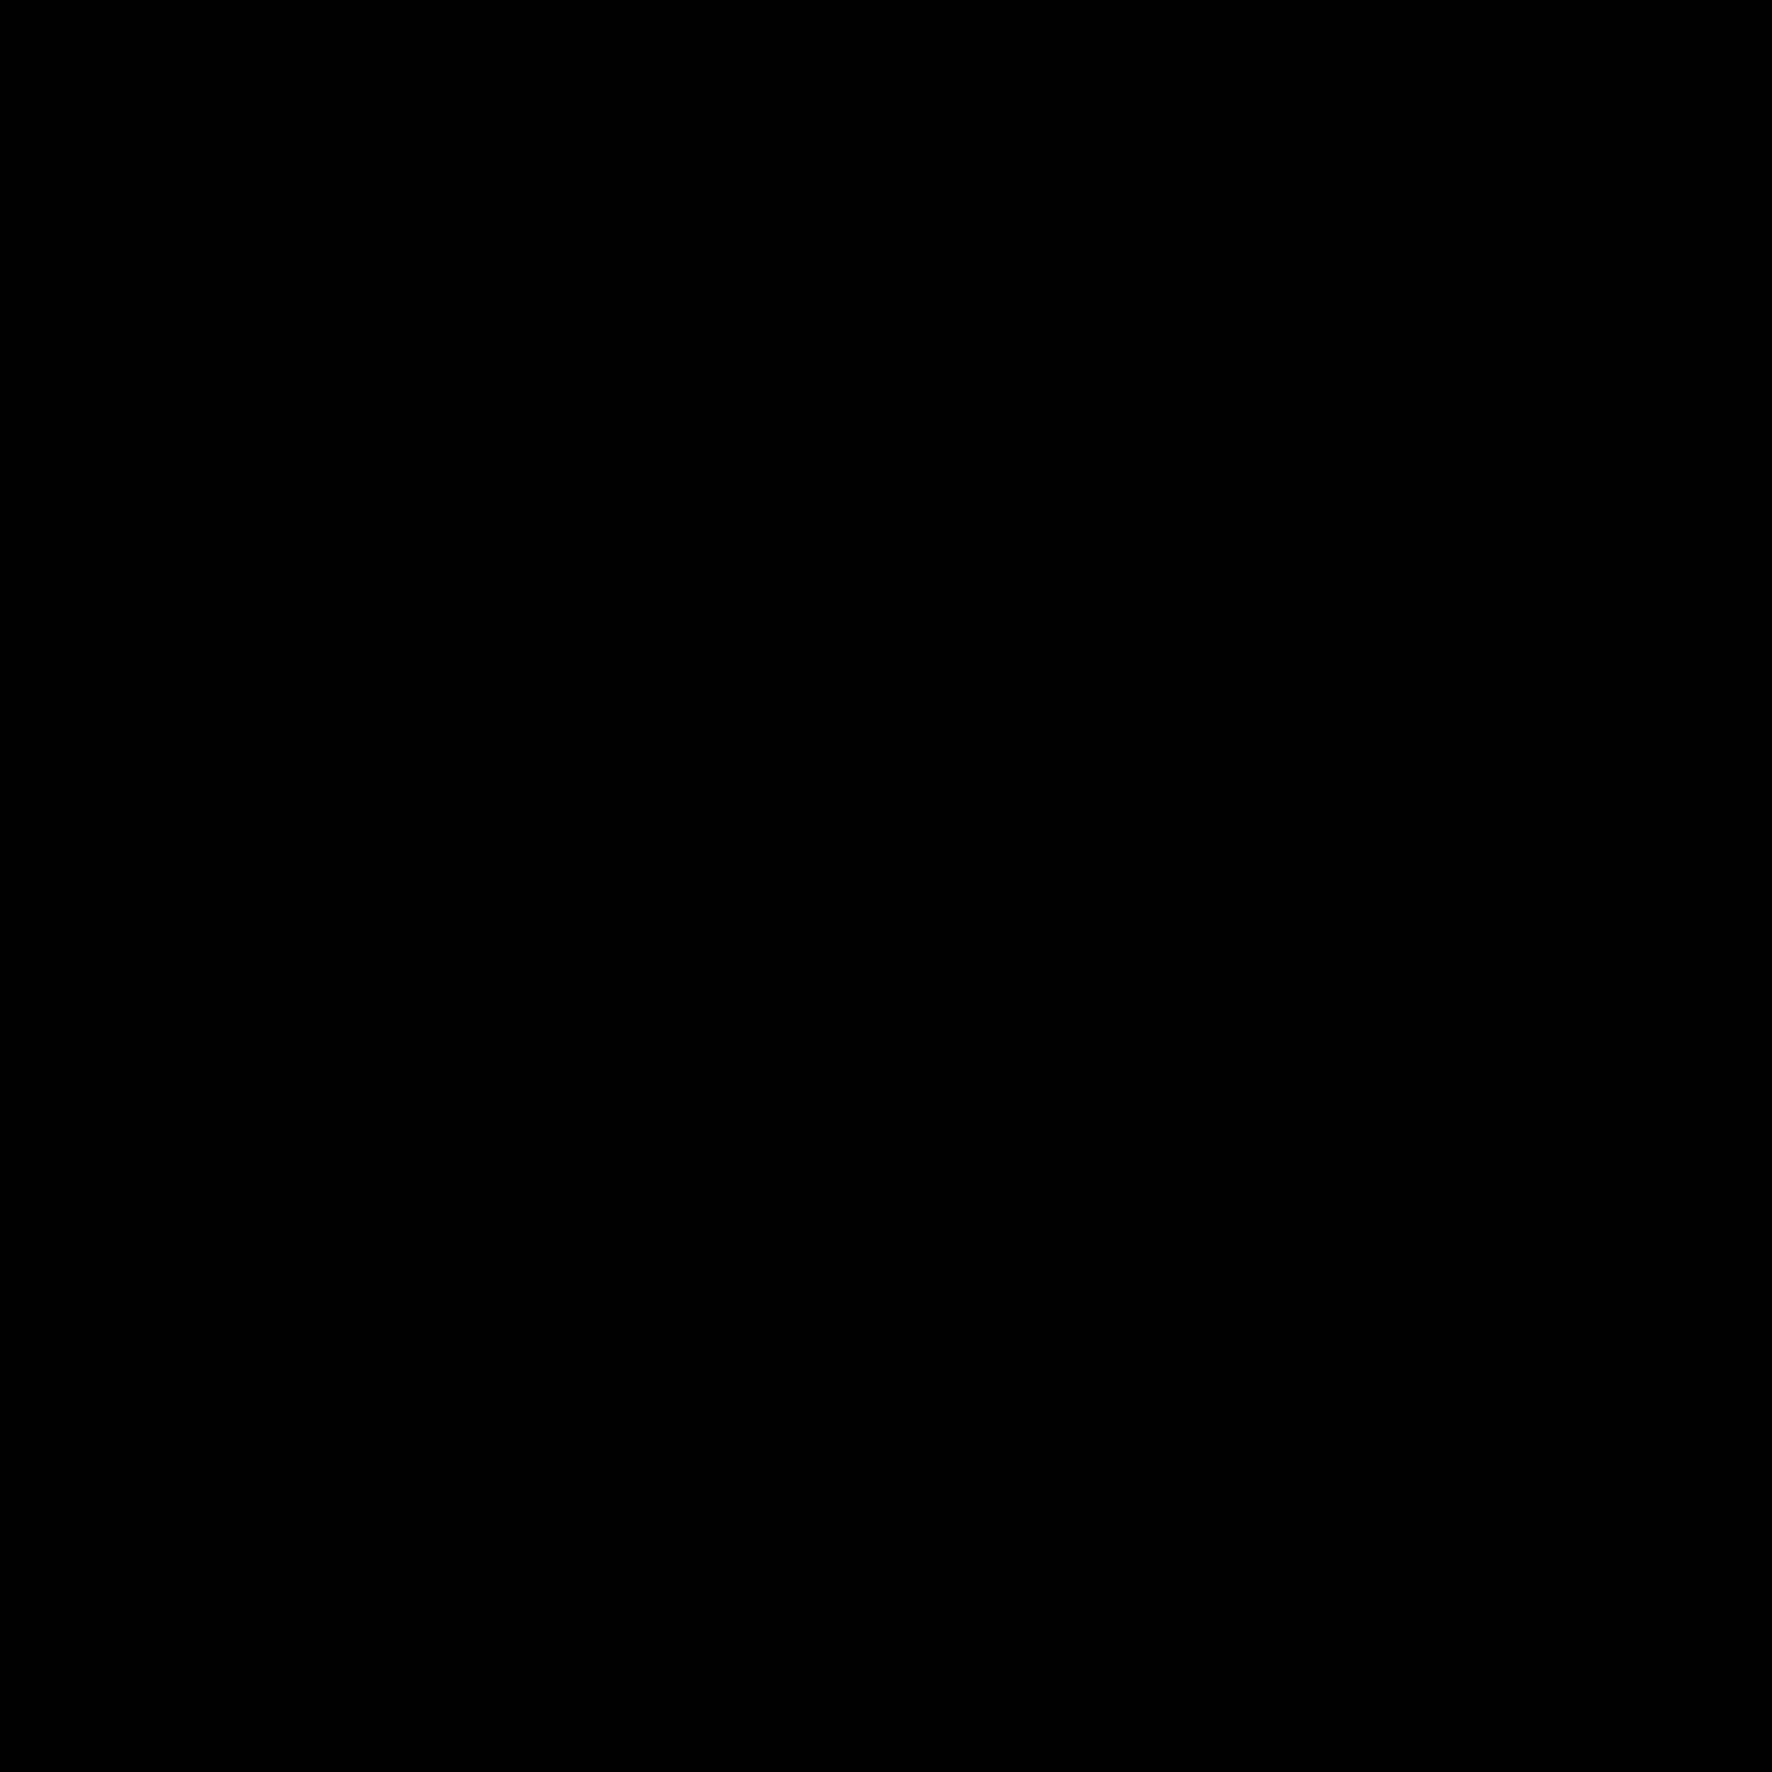 Octante-et-Onze